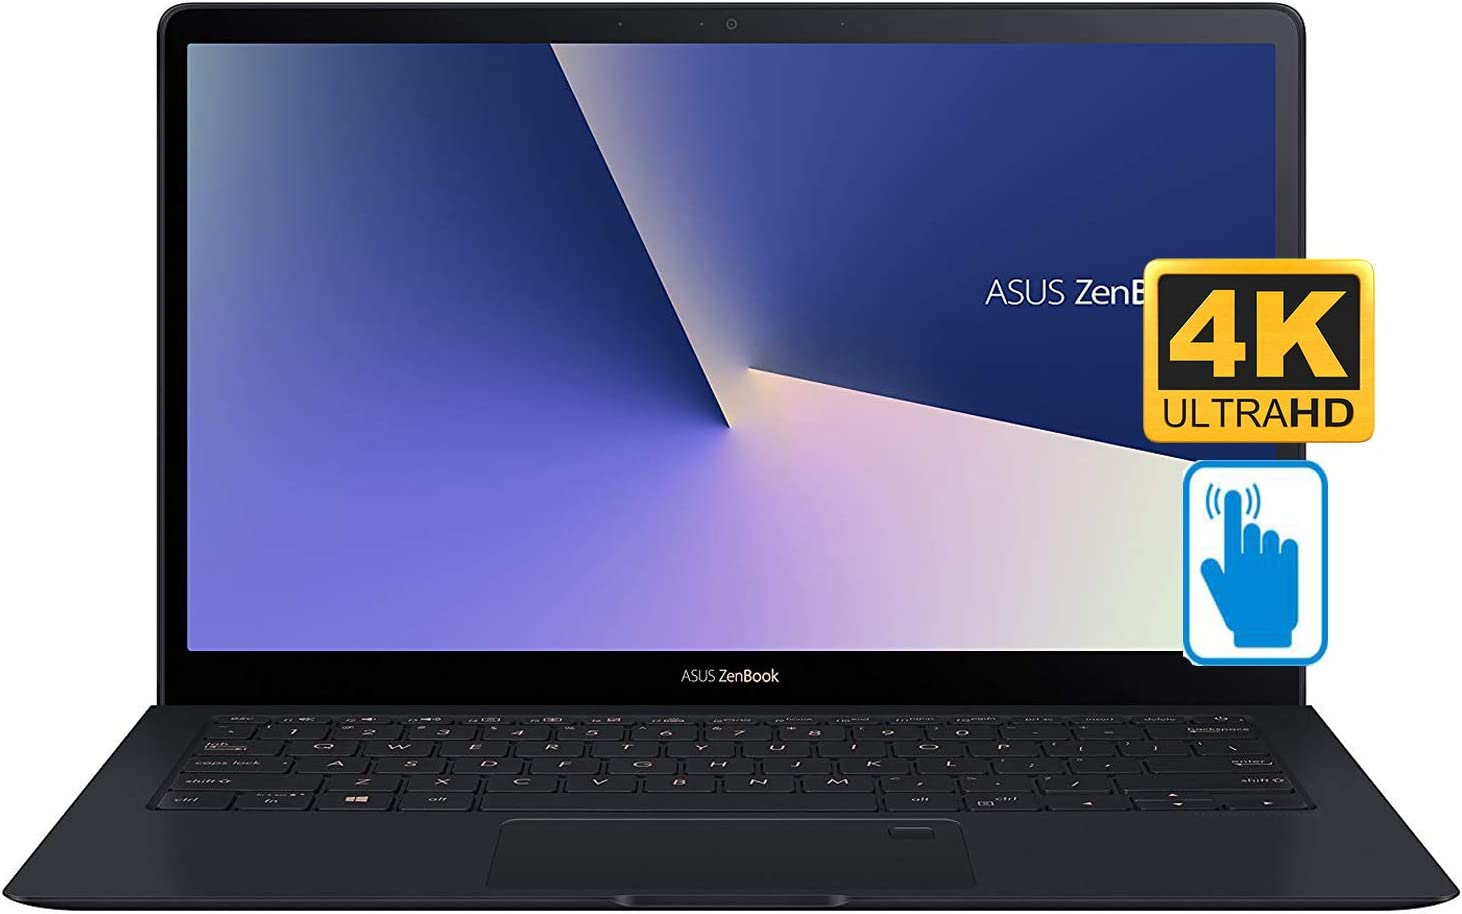 "ASUS ZenBook S Ultra-Thin and Light Laptop (8th Generation Intel Core i7-8565U, 16GB RAM, 1TB M.2 PCIe SSD, 13.3"" Flat Touch 4K UHD (3840x2160) Display, UHD Graphics 620, Fingerprint, Win 10 Pro)"